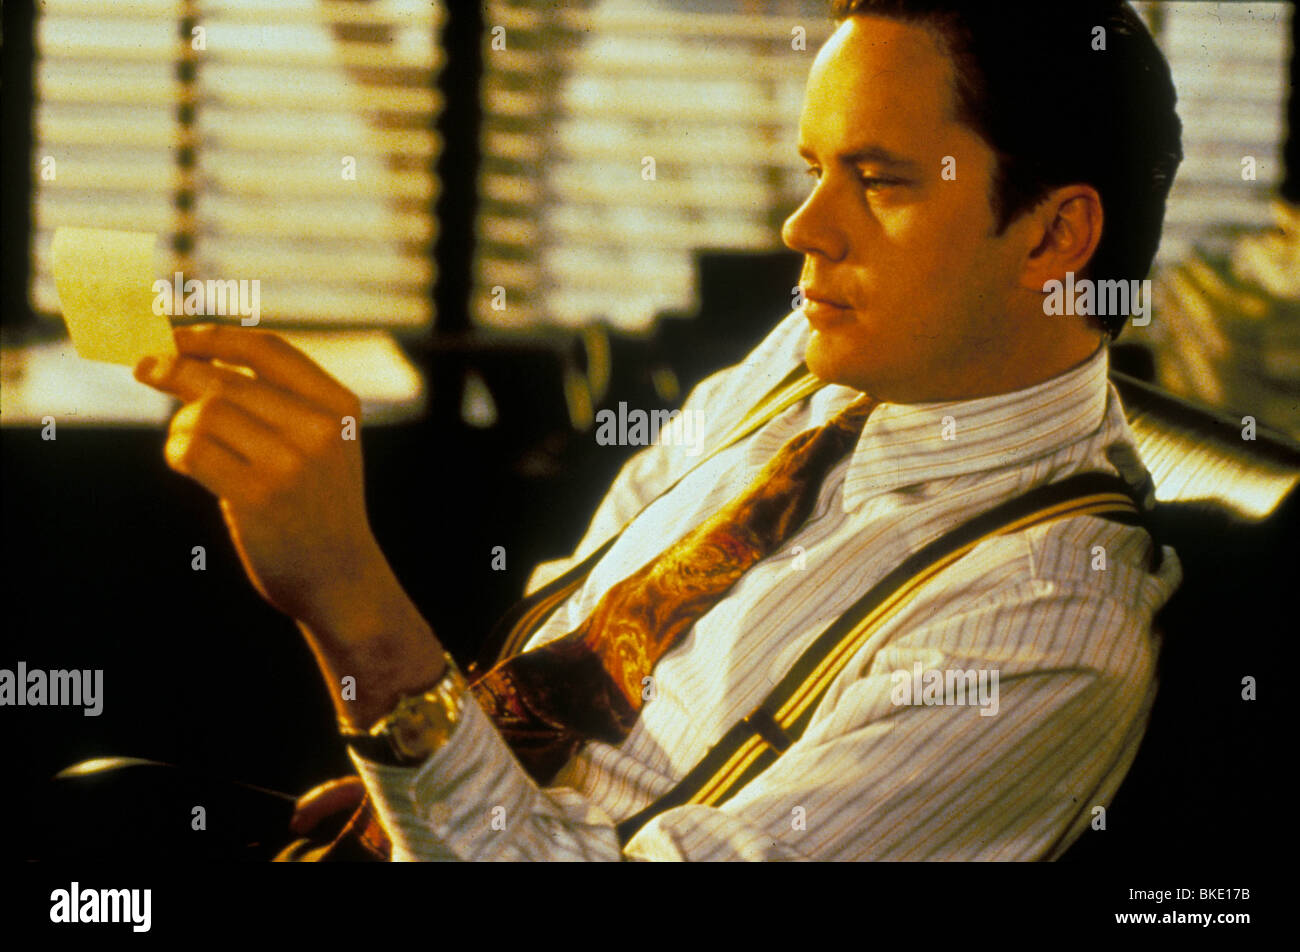 THE PLAYER -1991 TIM ROBBINS - Stock Image